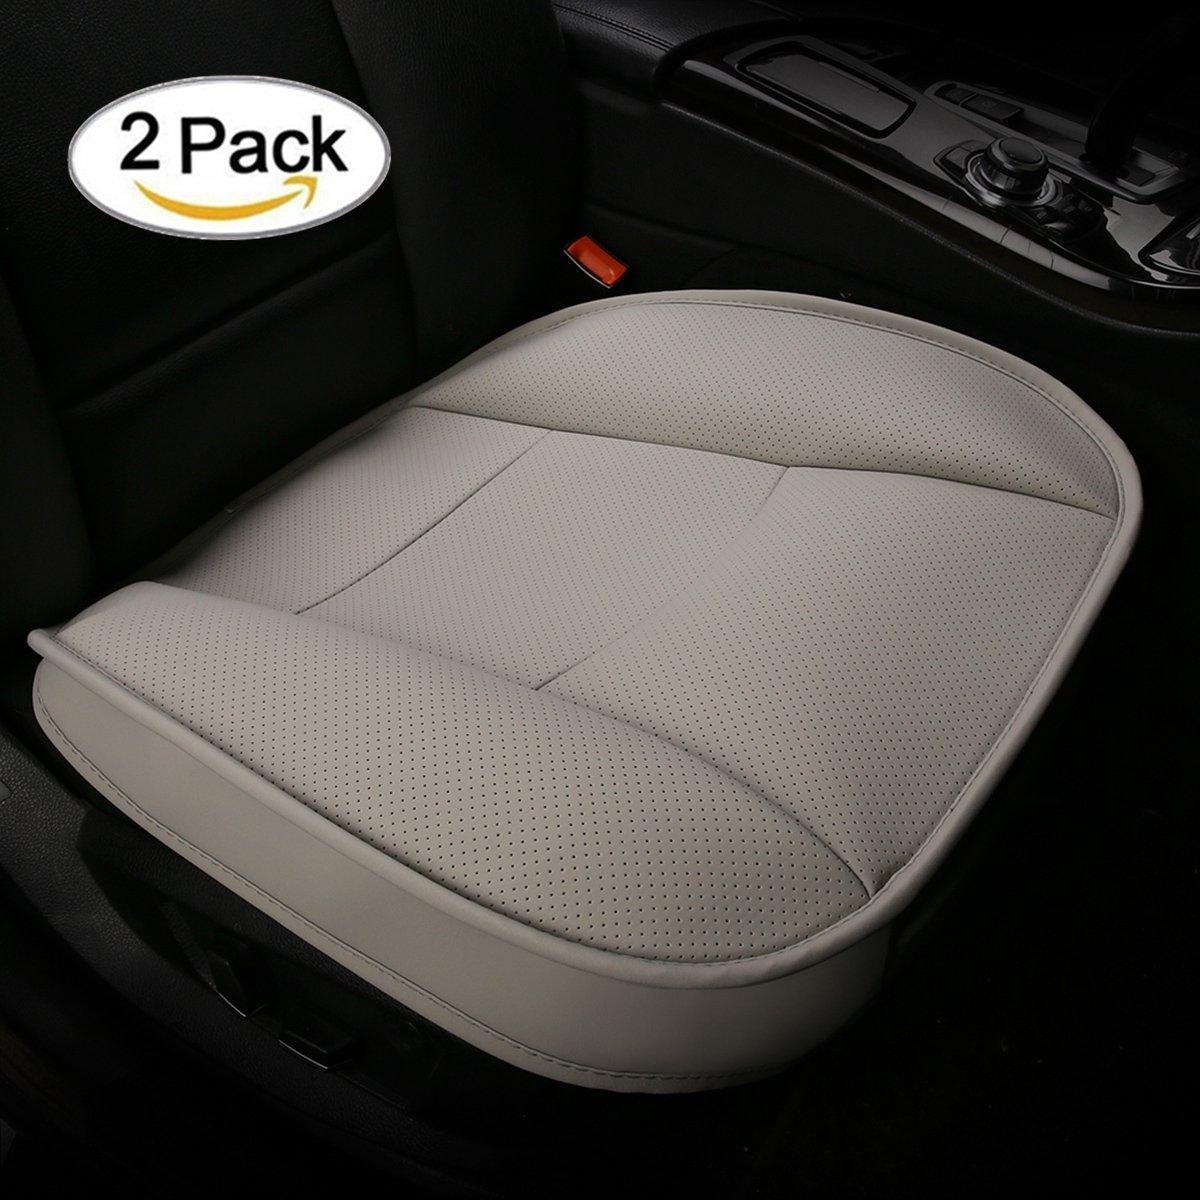 Coj/ín del asiento de coche x 20.5 W caf/&eacut CONMING Asiento de autom/óvil de carb/ón de le/ña Asiento de interior de autom/óvil Asiento de cuero de PU y cubierta de carb/ón de bamb/ú de la cubierta 19.7 L